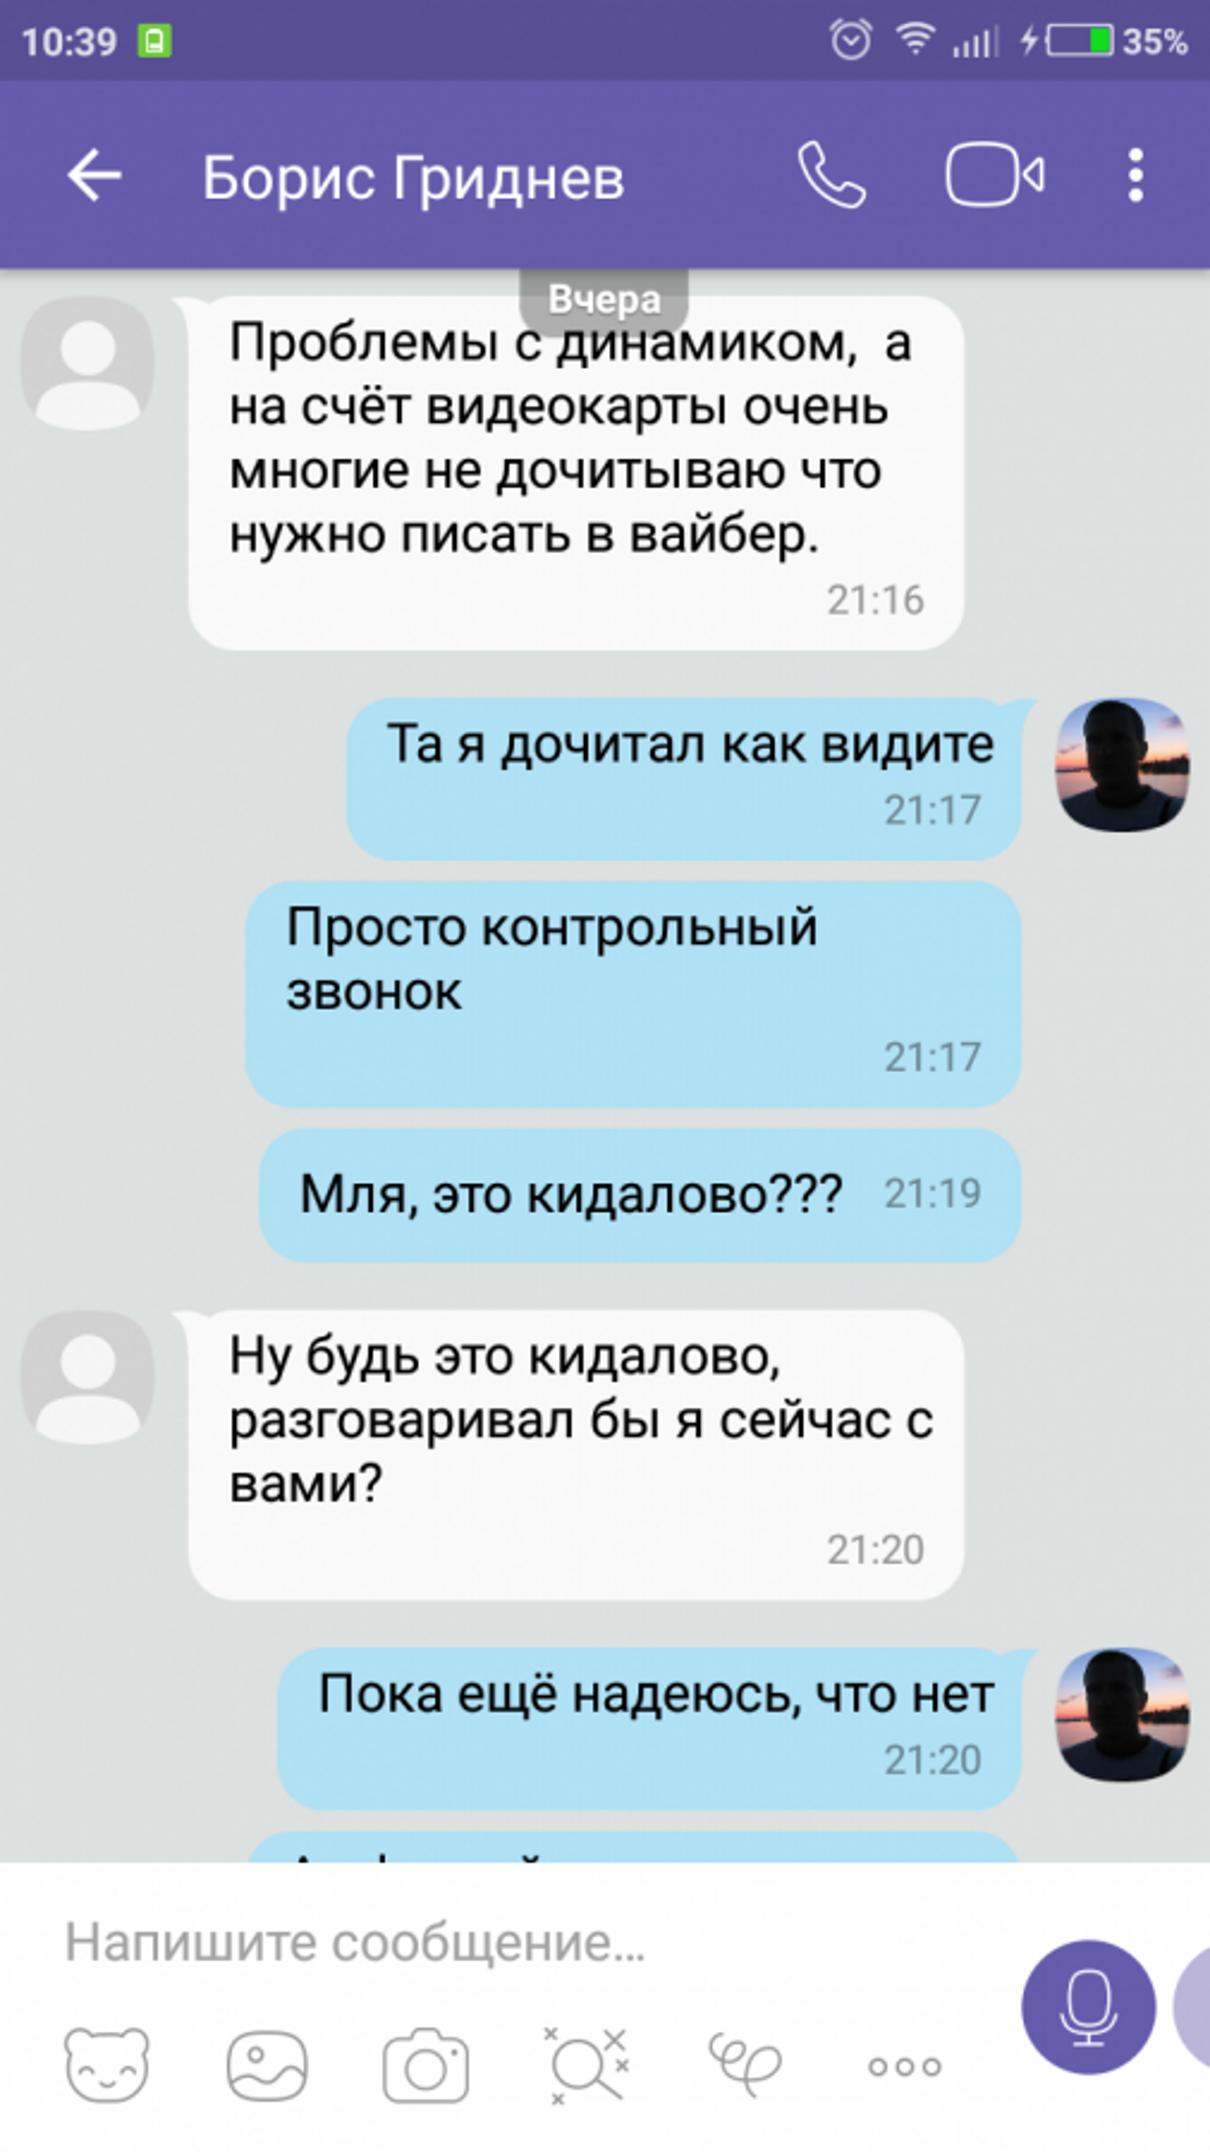 Жалоба-отзыв: Борис Гриднев - Мошенник с OLX, кидает на предоплату.  Фото №5